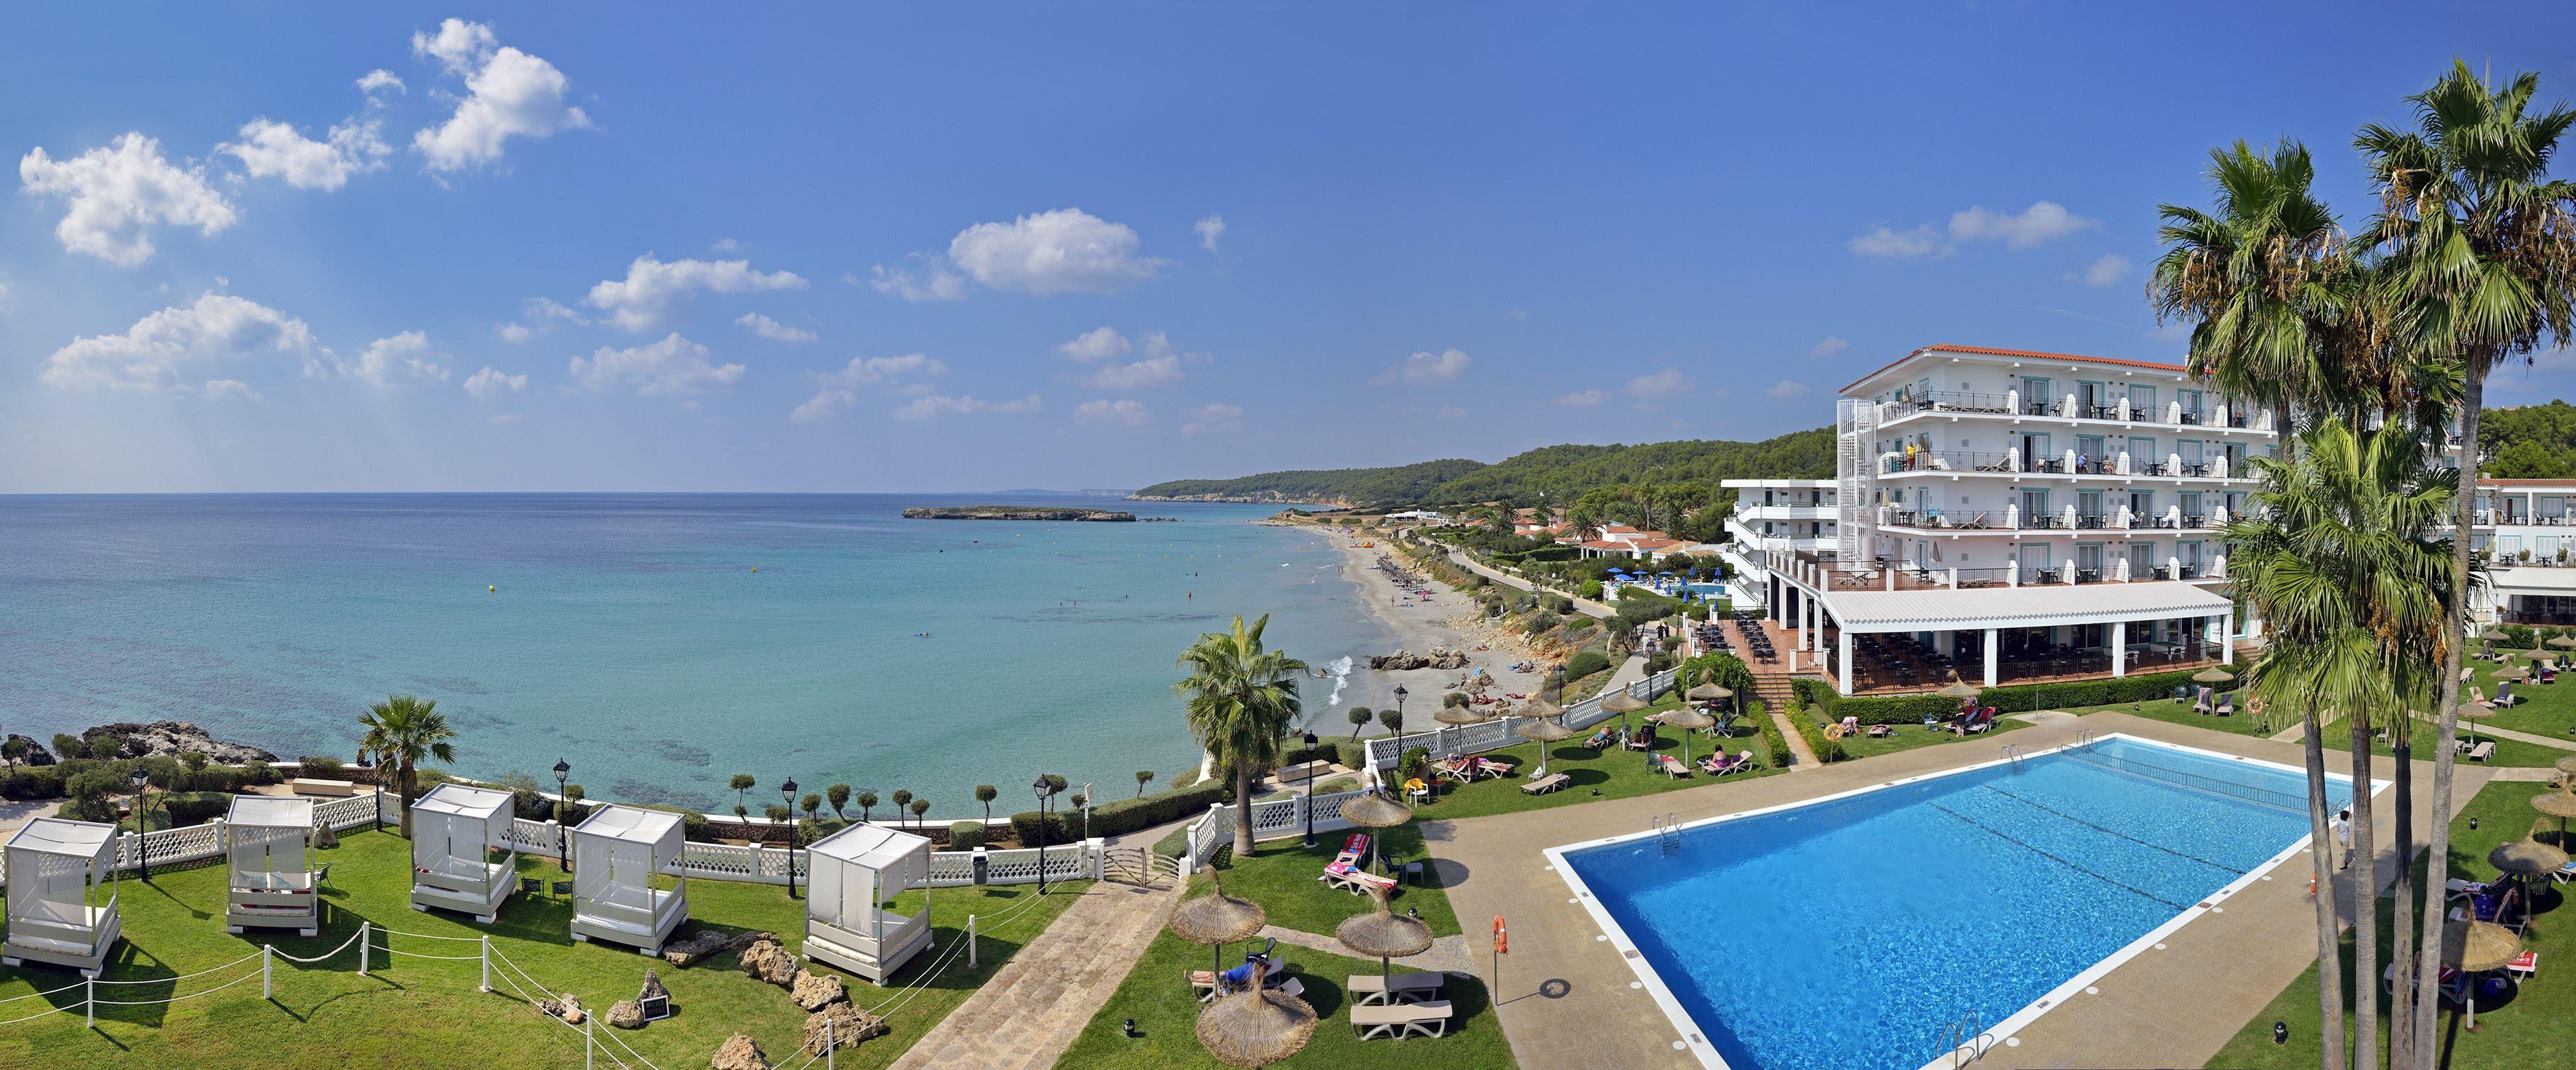 Panoramabild Hotell Sol Beach House, Santo Tomas Menorca